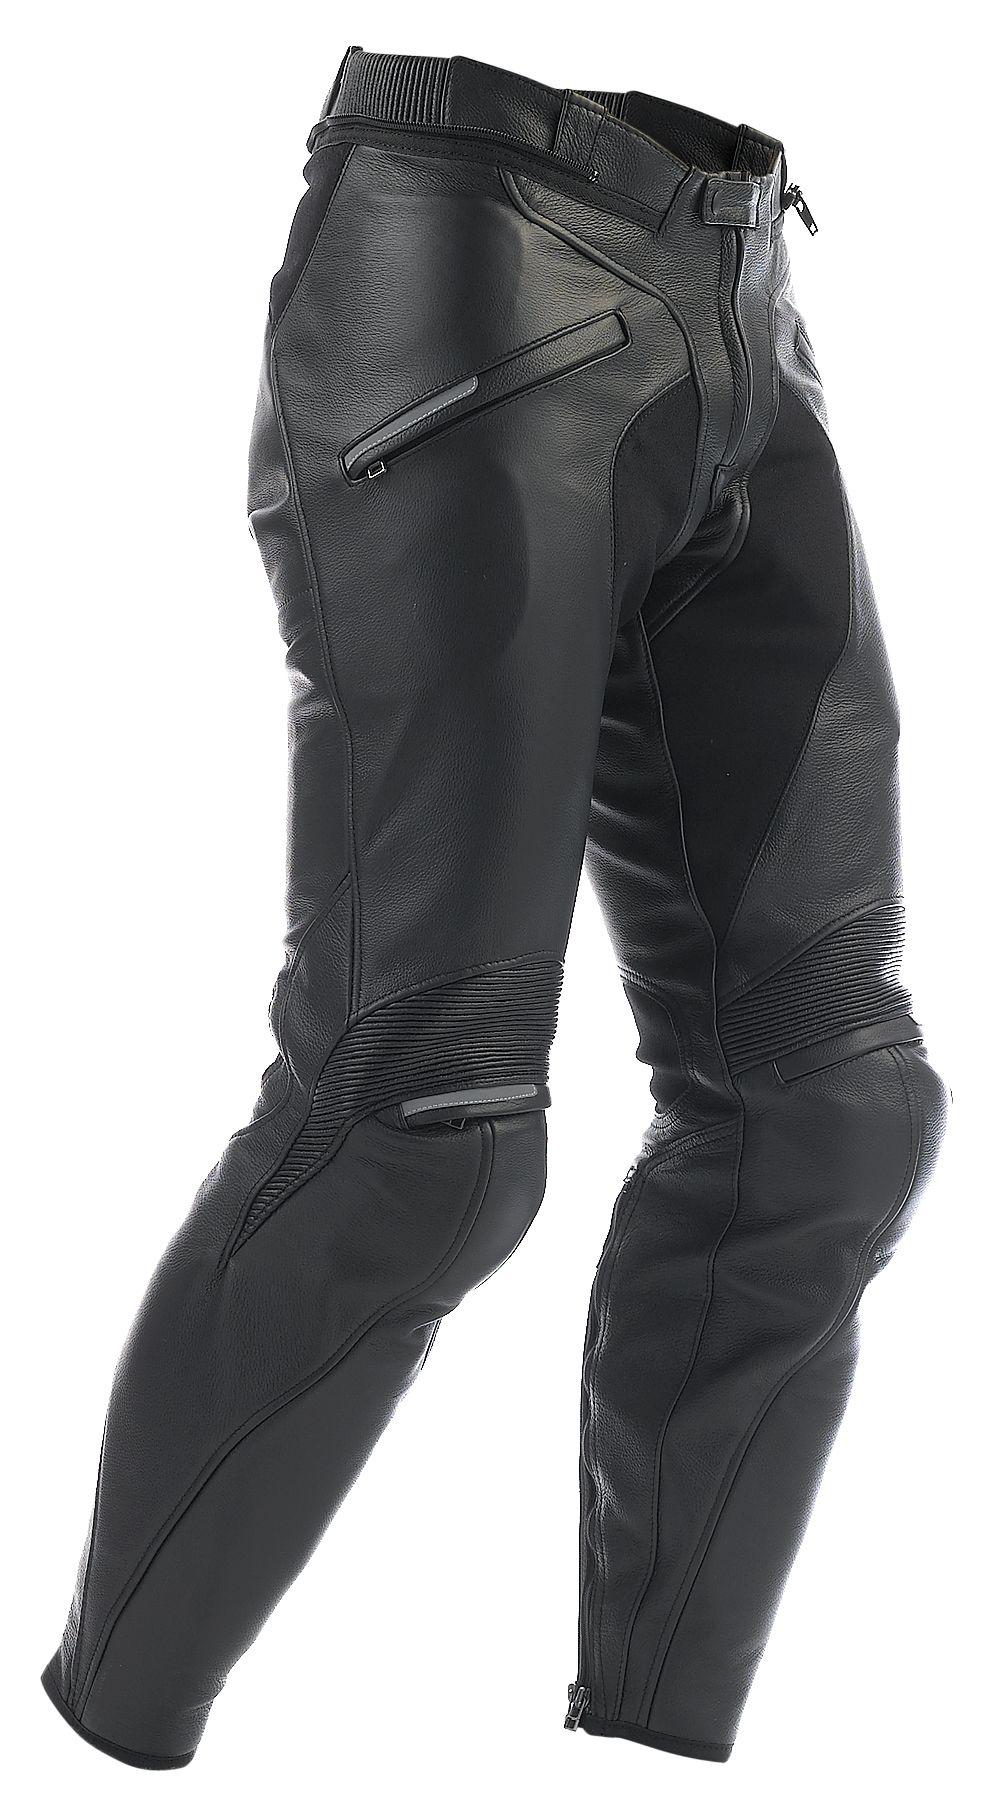 dainese alien leather pants revzilla. Black Bedroom Furniture Sets. Home Design Ideas